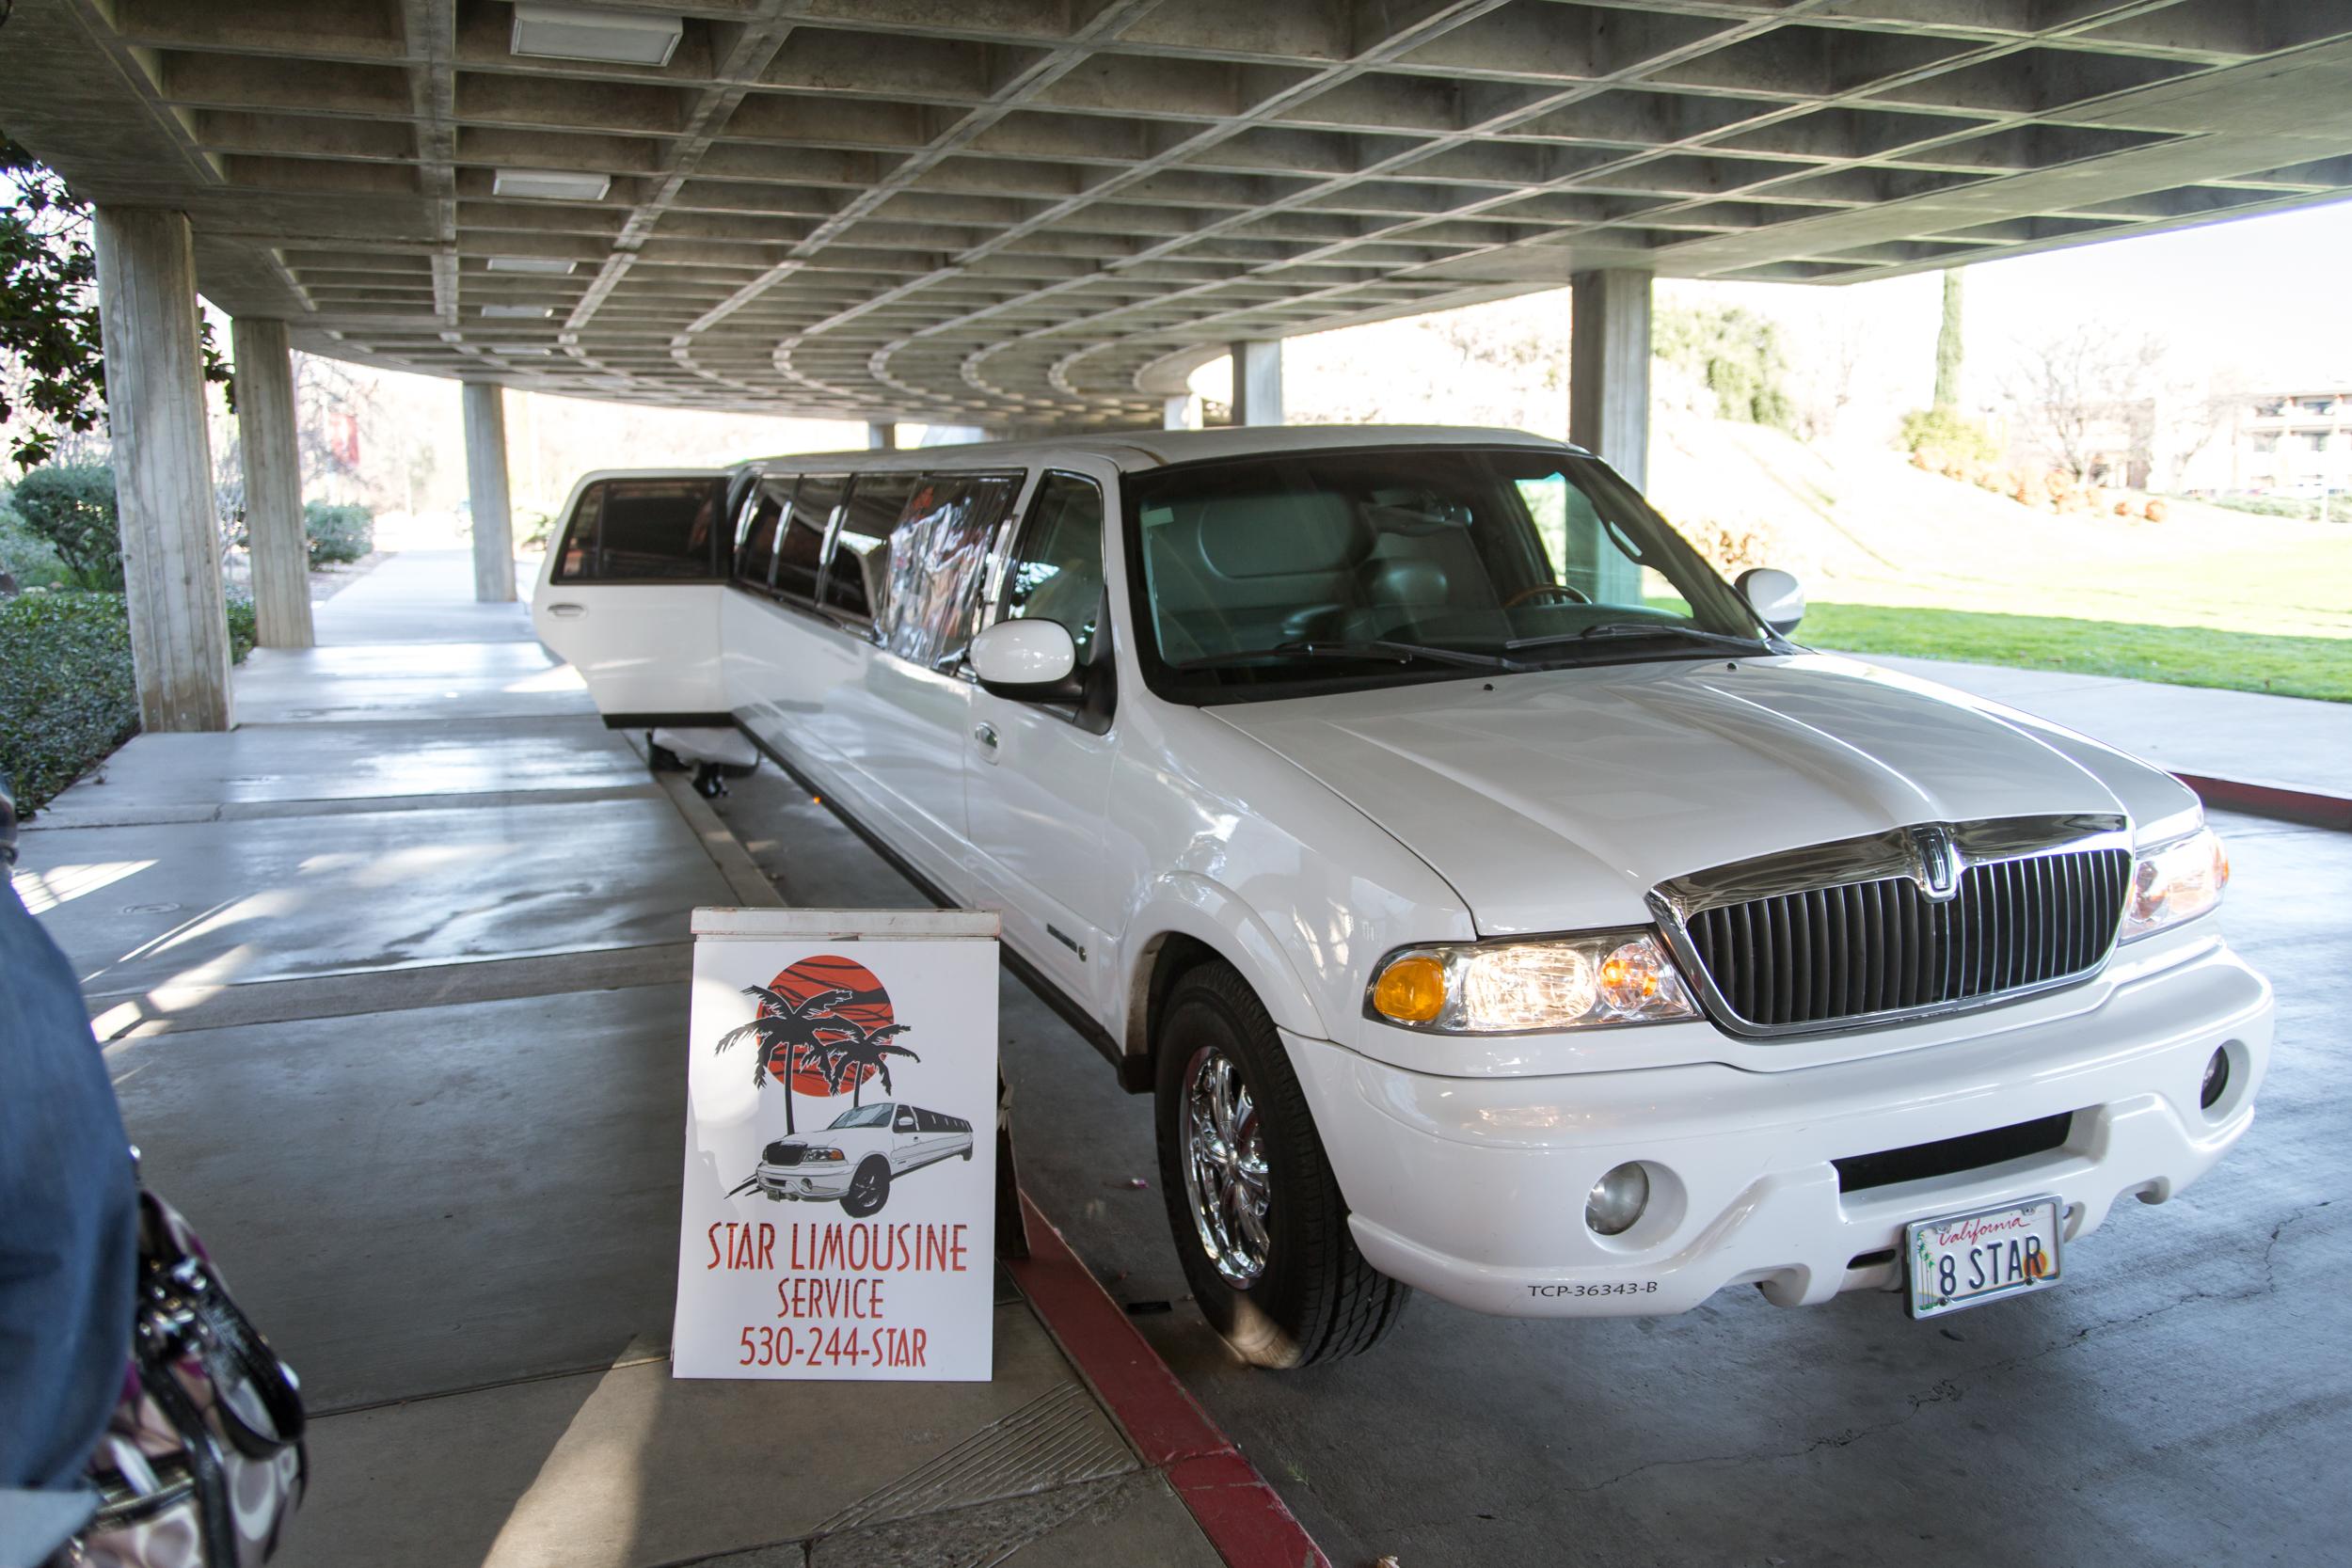 Star Limousine Service Redding Bridal Show Wedding Expo